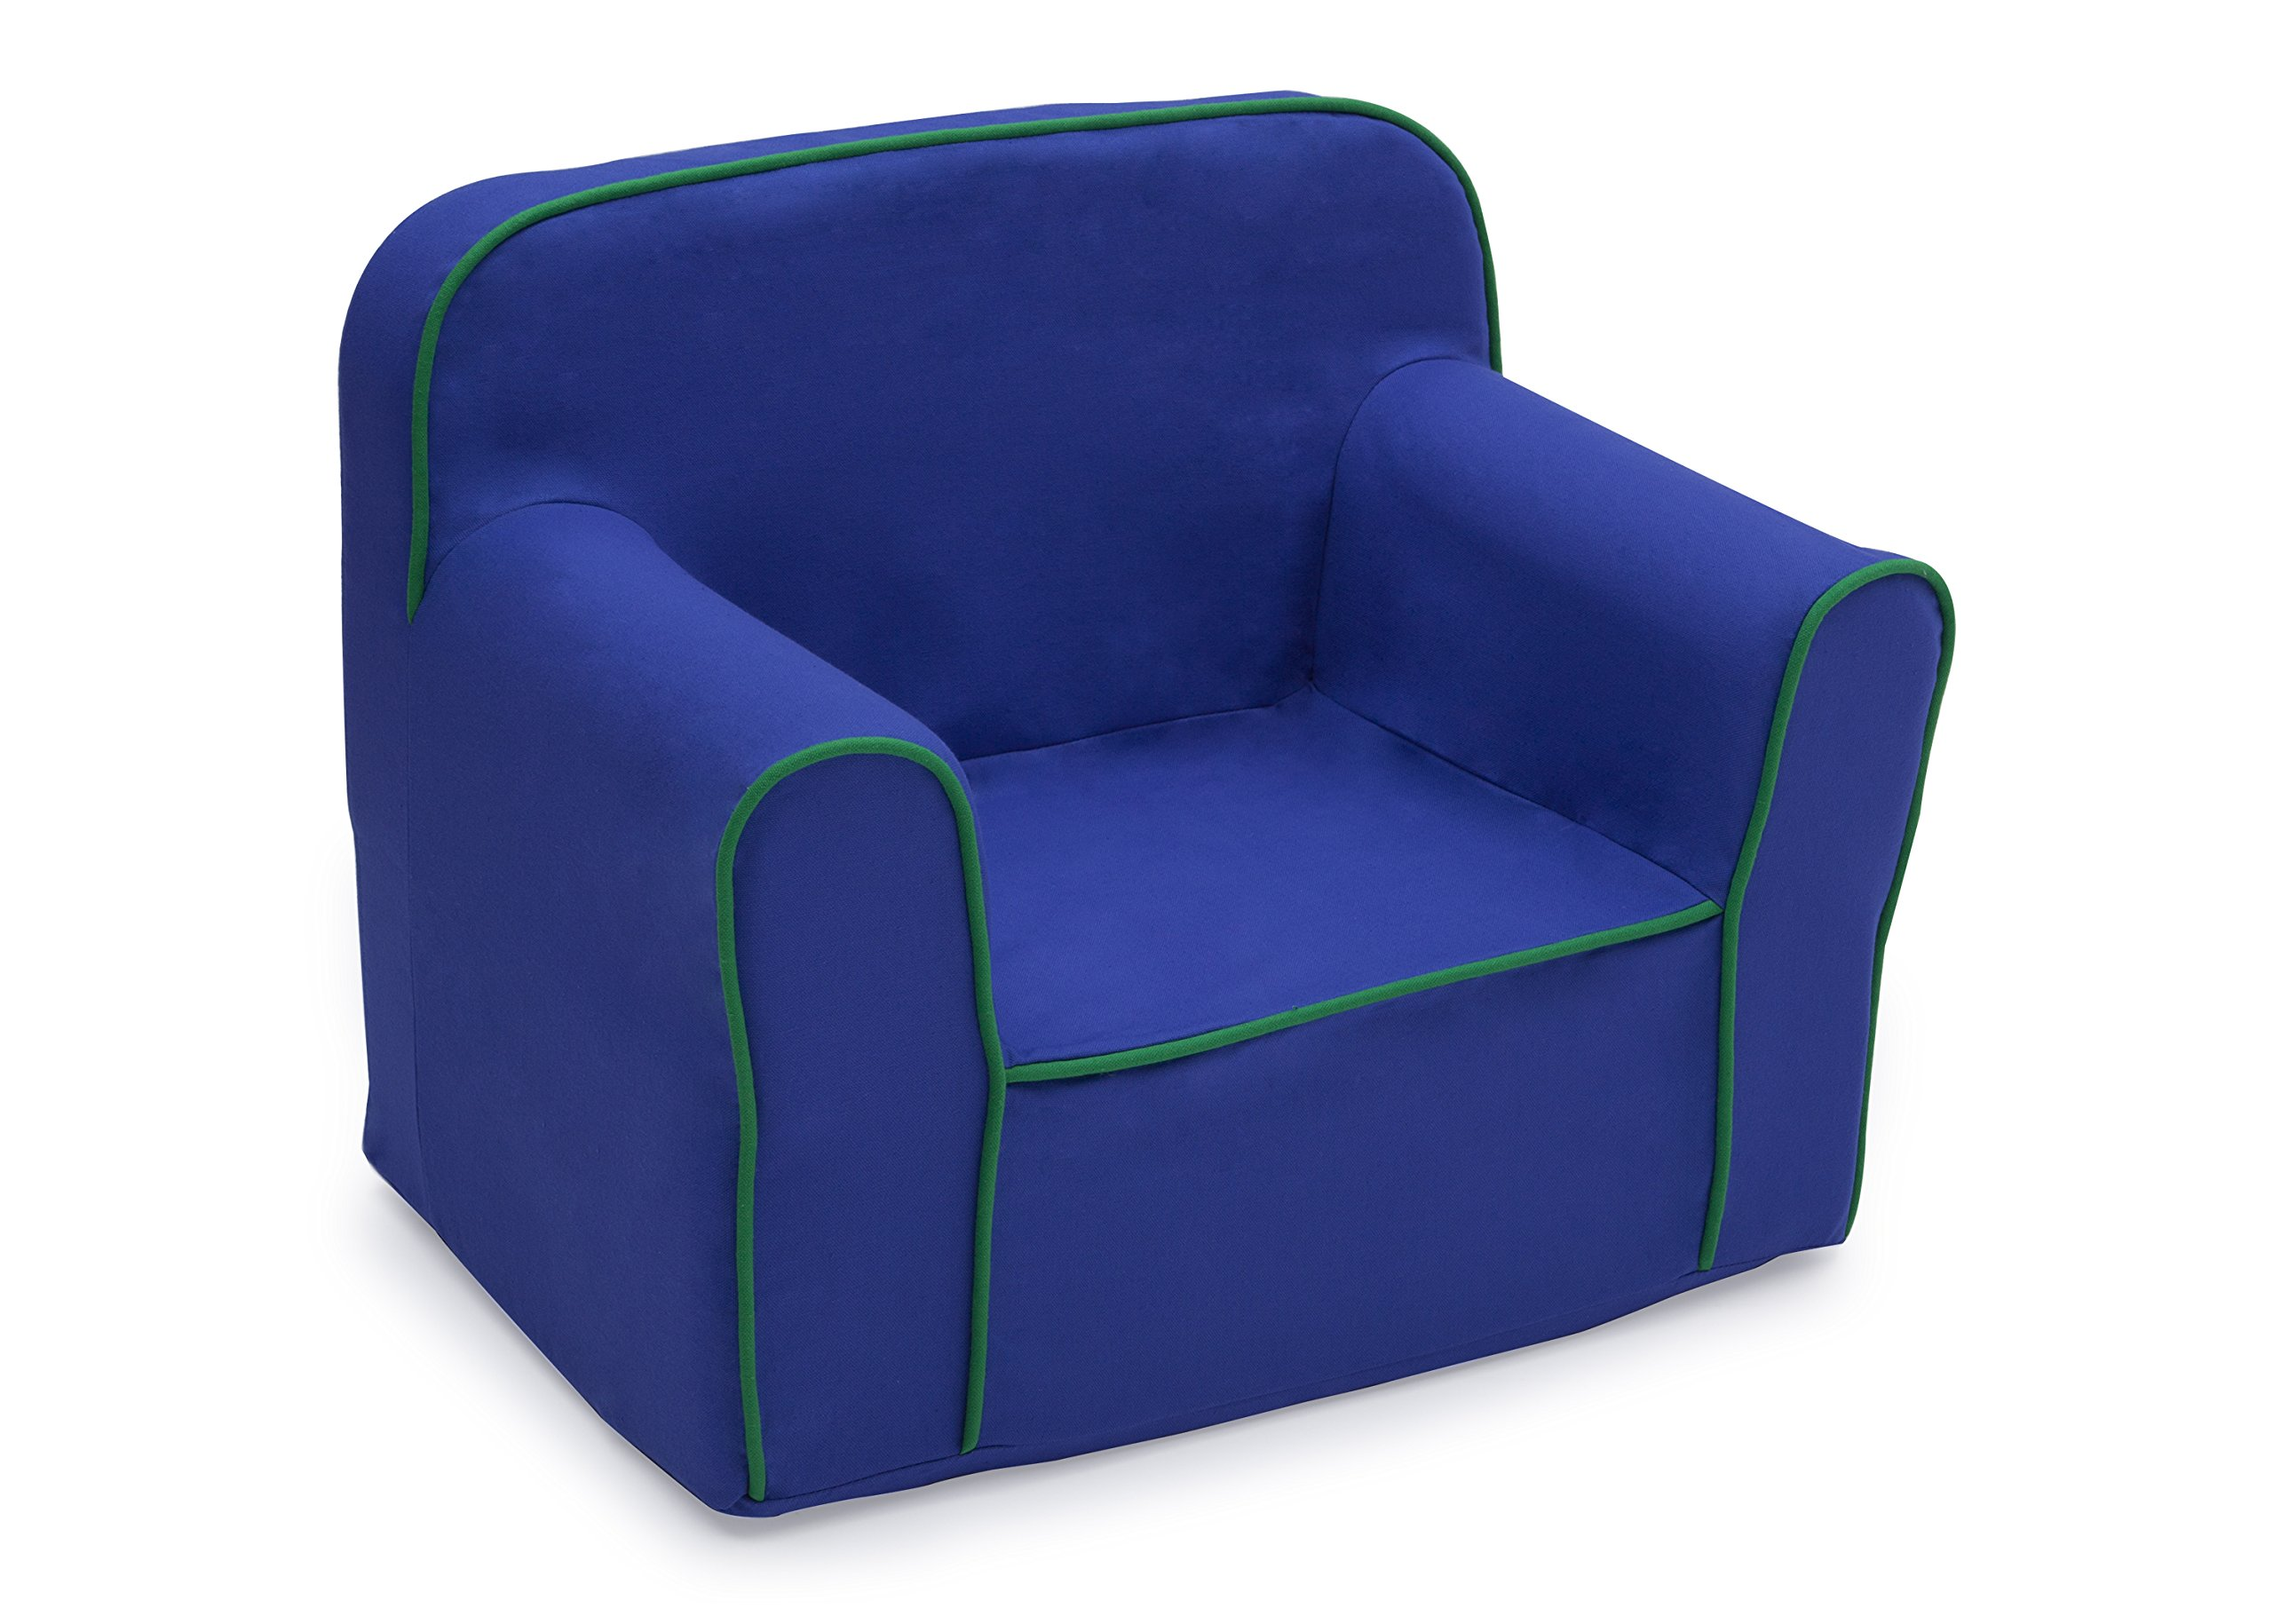 Delta Children Foam Snuggle Chair, Blue with Green